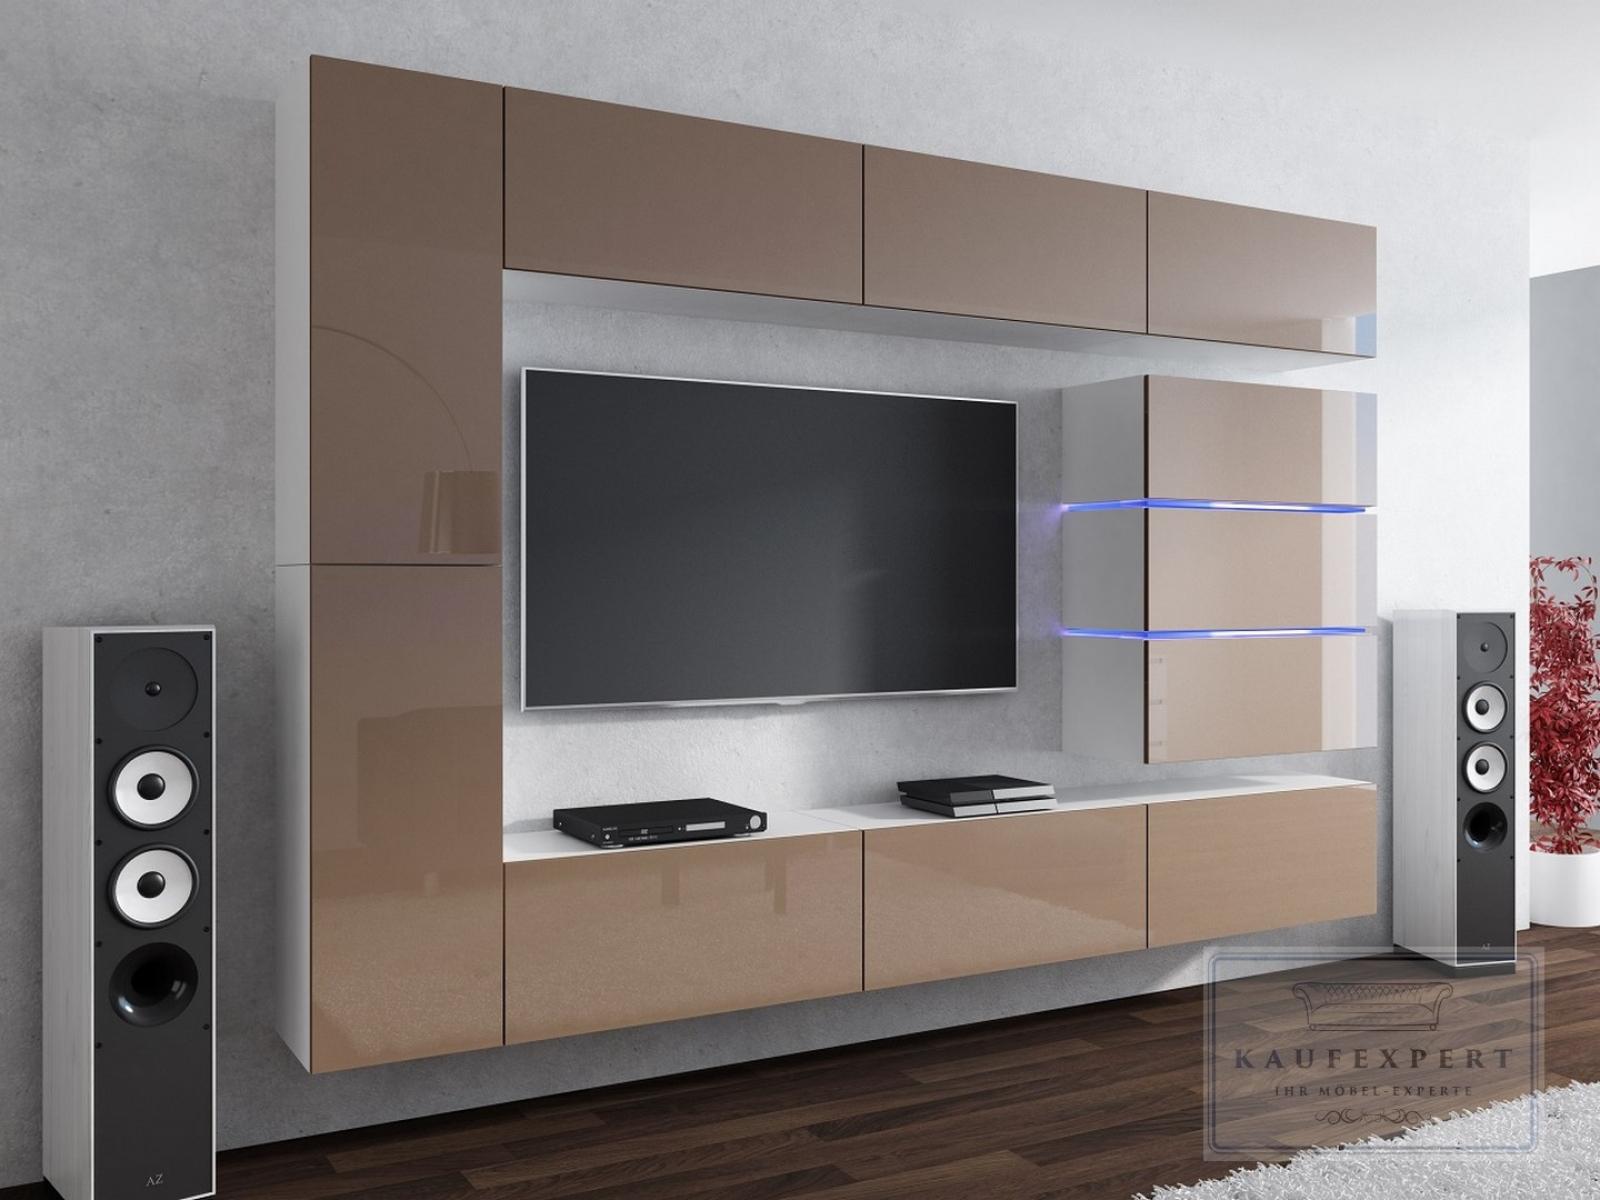 Kaufexpert wohnwand shine cappuccino hochglanz wei 284 cm mediawand medienwand design modern - Wohnwand cappuccino ...